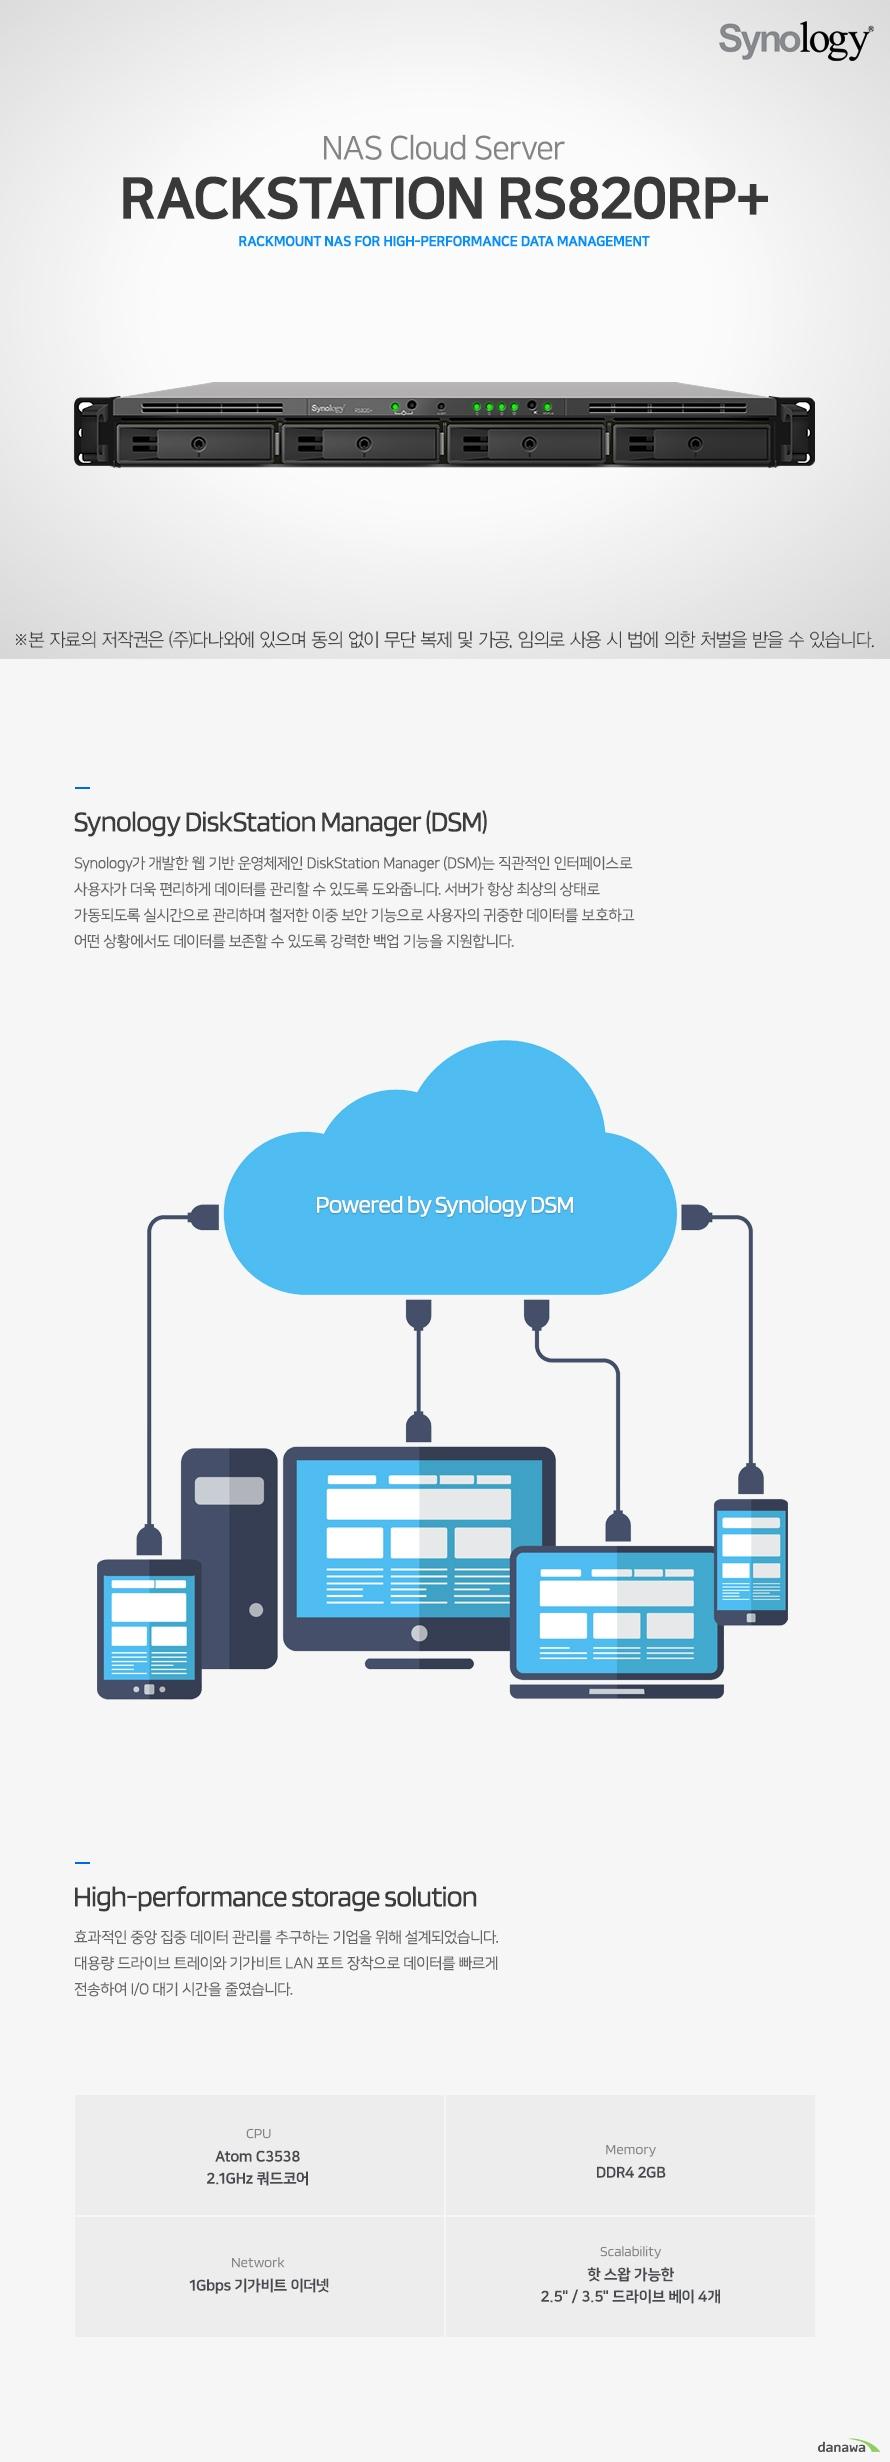 NAS Cloud Server RackStation RS820RP+ Synology DiskStation Manager (DSM) Synology가 개발한 웹 기반 운영체제인 DiskStation Manager (DSM)는 직관적인 인터페이스로 사용자가 더욱 편리하게 데이터를 관리할 수 있도록 도와줍니다. 서버가 항상 최상의 상태로 가동되도록 실시간으로 관리하며 철저한 이중 보안 기능으로 사용자의 귀중한 데이터를 보호하고 어떤 상황에서도 데이터를 보존할 수 있도록 강력한 백업 기능을 지원합니다. High-performance storage solution 효과적인 중앙 집중 데이터 관리를 추구하는 기업을 위해 설계되었습니다. 대용량 드라이브 트레이와 기가비트 LAN 포트 장착으로 데이터를 빠르게 전송하여 I/O 대기 시간을 줄였습니다. Ultimate Backup Solution 직관적인 사용자 인터페이스에 다양한 백업 응용 프로그램을 통합하고 있어, 지속형 저장소 기술을 통해 모든 장치에 있는 소중한 데이터를 보호합니다. Active Backup for Business 백업 작업을 한 곳에서 제어하므로, 콘솔 한 대에서 간단하게 관리할 수 있습니다. Hyper Backup 데이터가 로컬, 외부 장치, 클라우드에 포괄적으로 백업되므로, 데이터 안전성이 강화됩니다. Synology Drive Synology Drive Client로 실시간 데이터 백업 및 특정 시점 파일 복구를 수행하세요. Next-generation file system for better data protection Btrfs 파일 시스템은 데이터 손상을 방지하고 유지 관리 부담을 줄일 수 있는  고급 스토리지 기술과 최적화된 스냅샷을 도입합니다. 높은 수준의 데이터 무결성을 유지하면서 유연하고 효율적인 데이터 보호 및 복구 도구를 제공합니다. 폴더/사용자 할당량 제어 폴더/사용자 할당량 제어를 통해  공유 폴더의 할당량을 제어할 수 있습니다 스냅샷 복제 공유 폴더 백업 및 스냅샷과 함께 저장소 용량을 절약하는 데이터 보호를 제공합니다 자동 파일 자가 치료 사용자가 개입하지 않아도 손상된 파일을 감지하고 복구합니다 유연한 데이터 복구 파일 또는 폴더 수준 데이터 복원으로 빠르고 유연하게 데이터를 복구할 수 있습니다. Synology Office Synology Office 문서, 스프레드 시트 및 슬라이드를 사용 하여 업무 능률을 높여보세요. 실시간 파일 동기화 기능과 강력한 데이터 백업 및 보호 기능을 제공합니다.